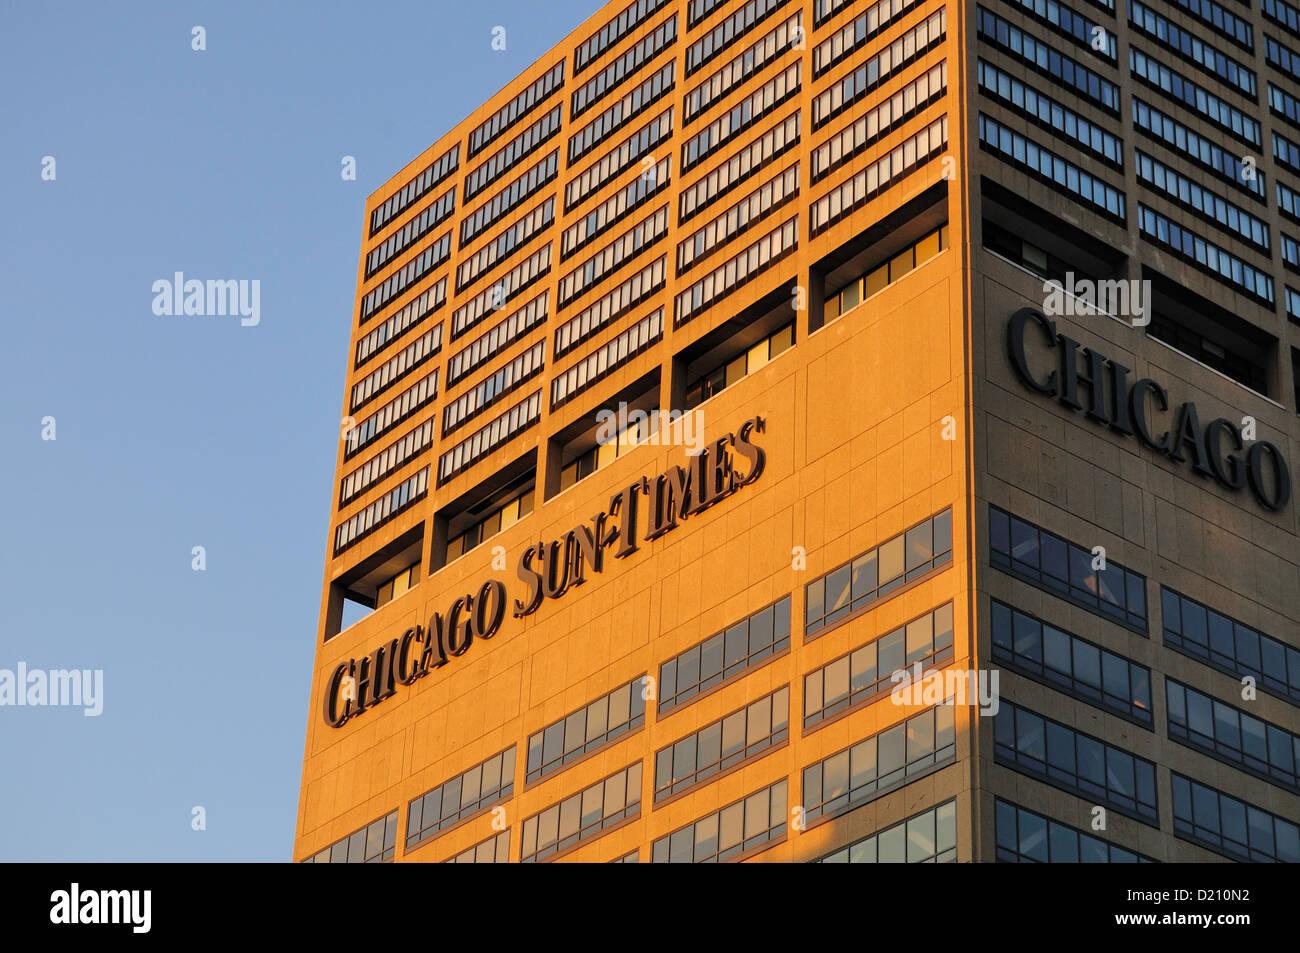 Chicago Sun-Times Building. Chicago, Illinois, USA. - Stock Image